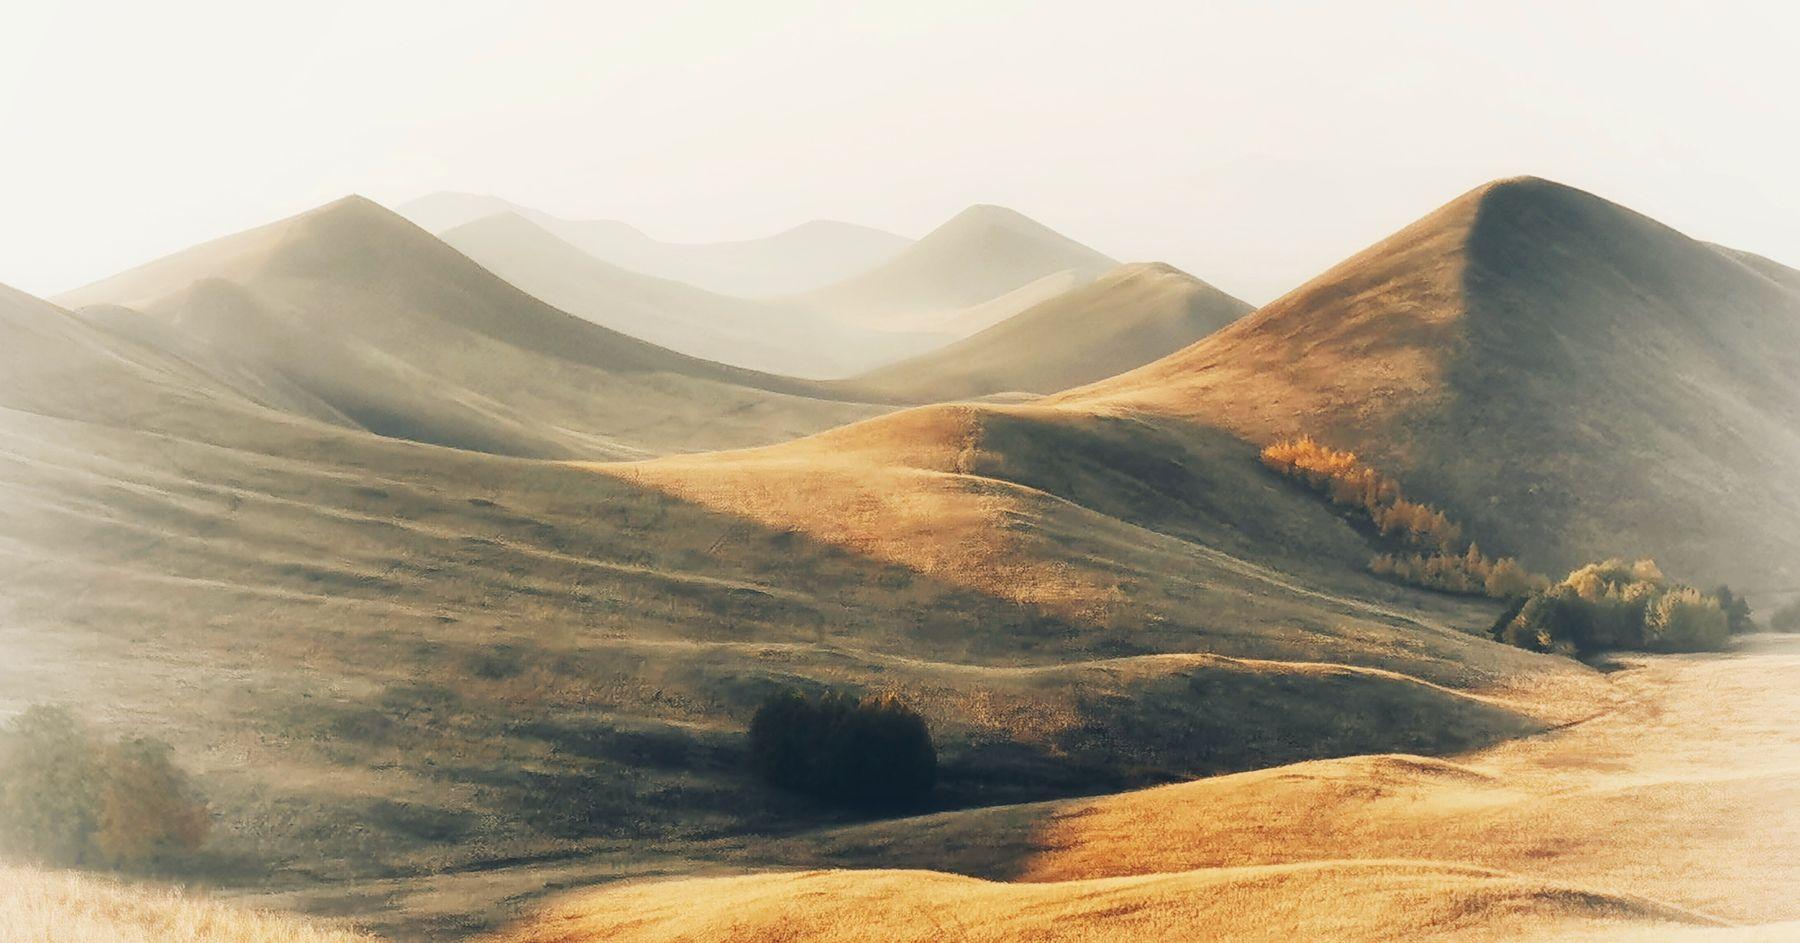 Mountain dreams Осень пейзаж природа утро рассвет